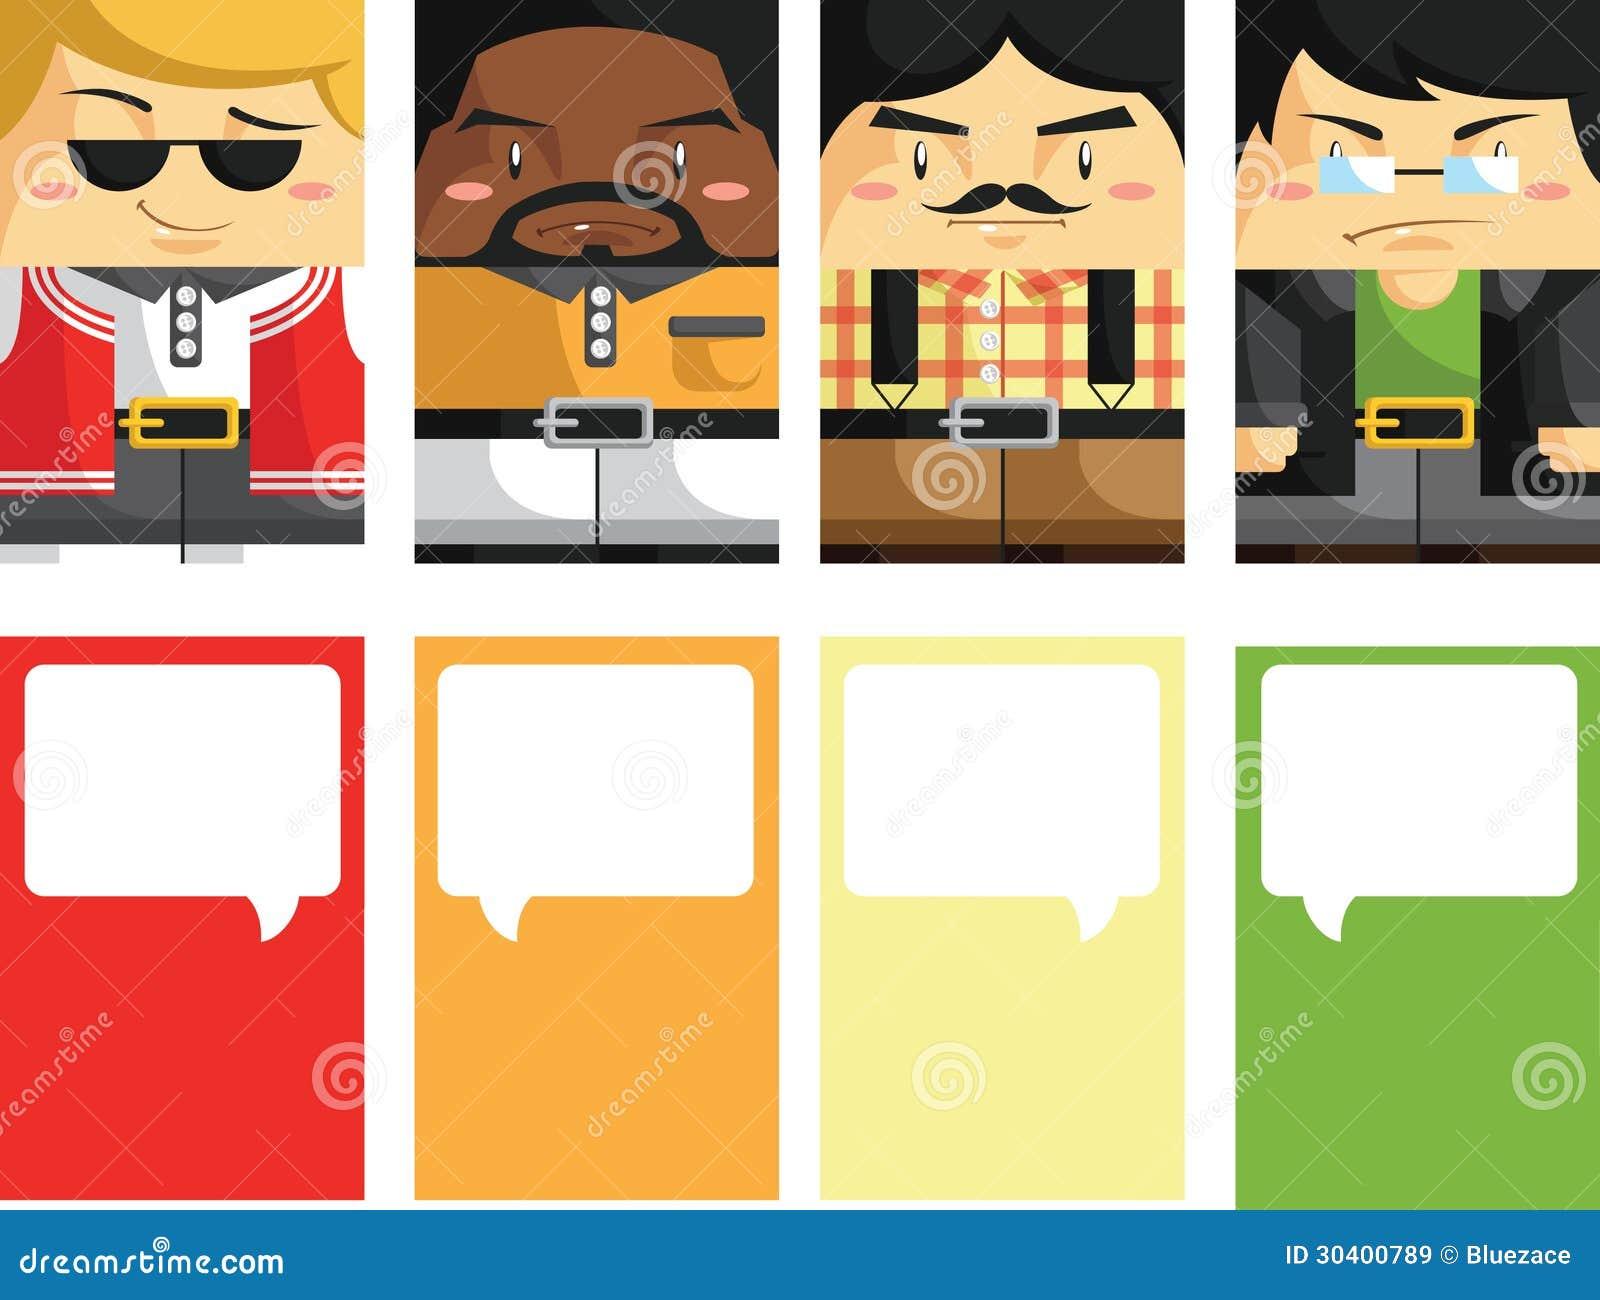 Creative Business Card With Customizable Illustrat Stock Vector ...